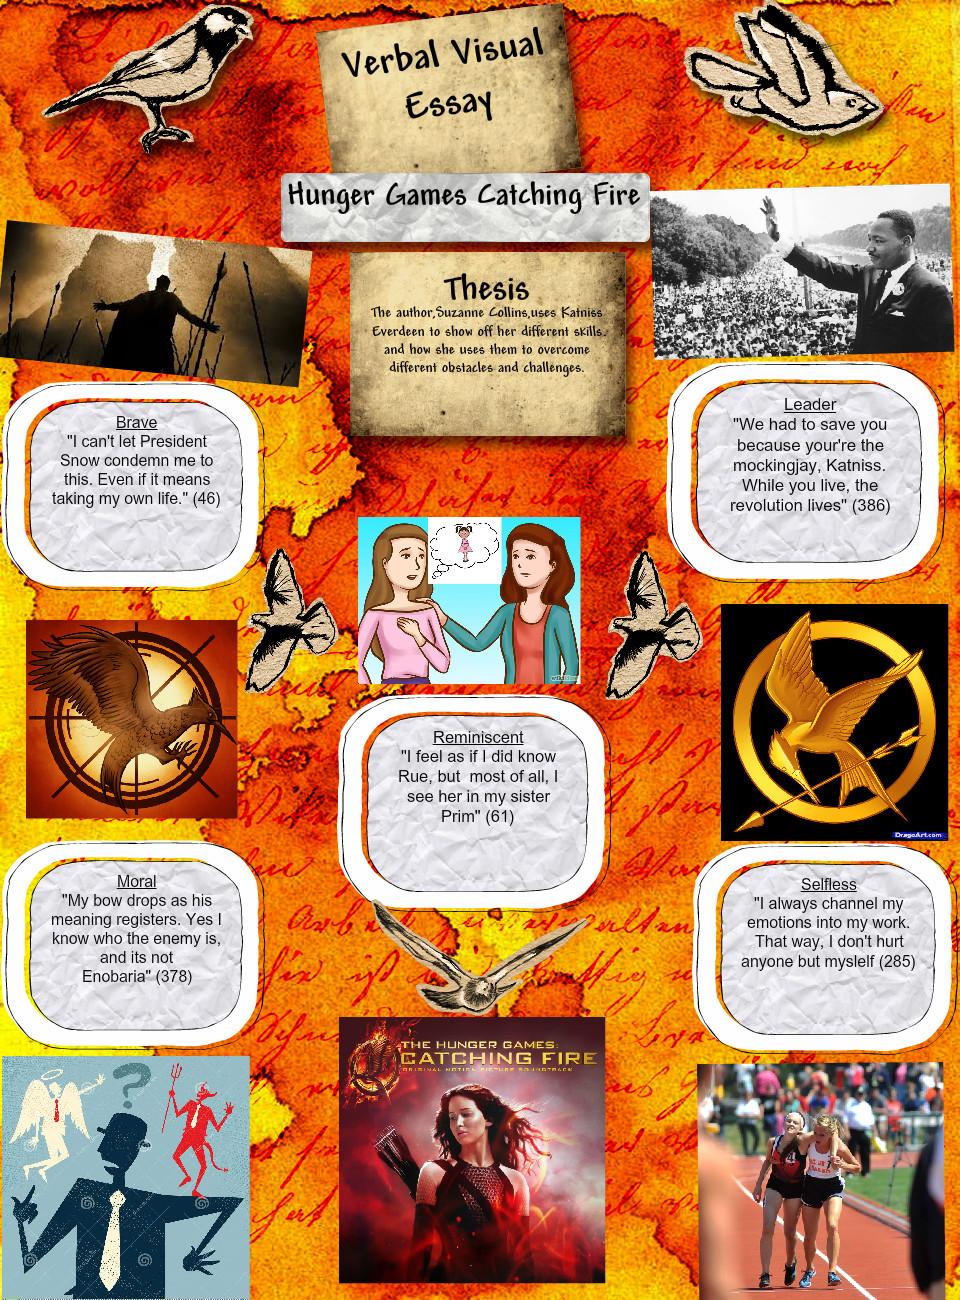 003 Source Essay Example Shocking Visual Response Examples Literacy Arts Full